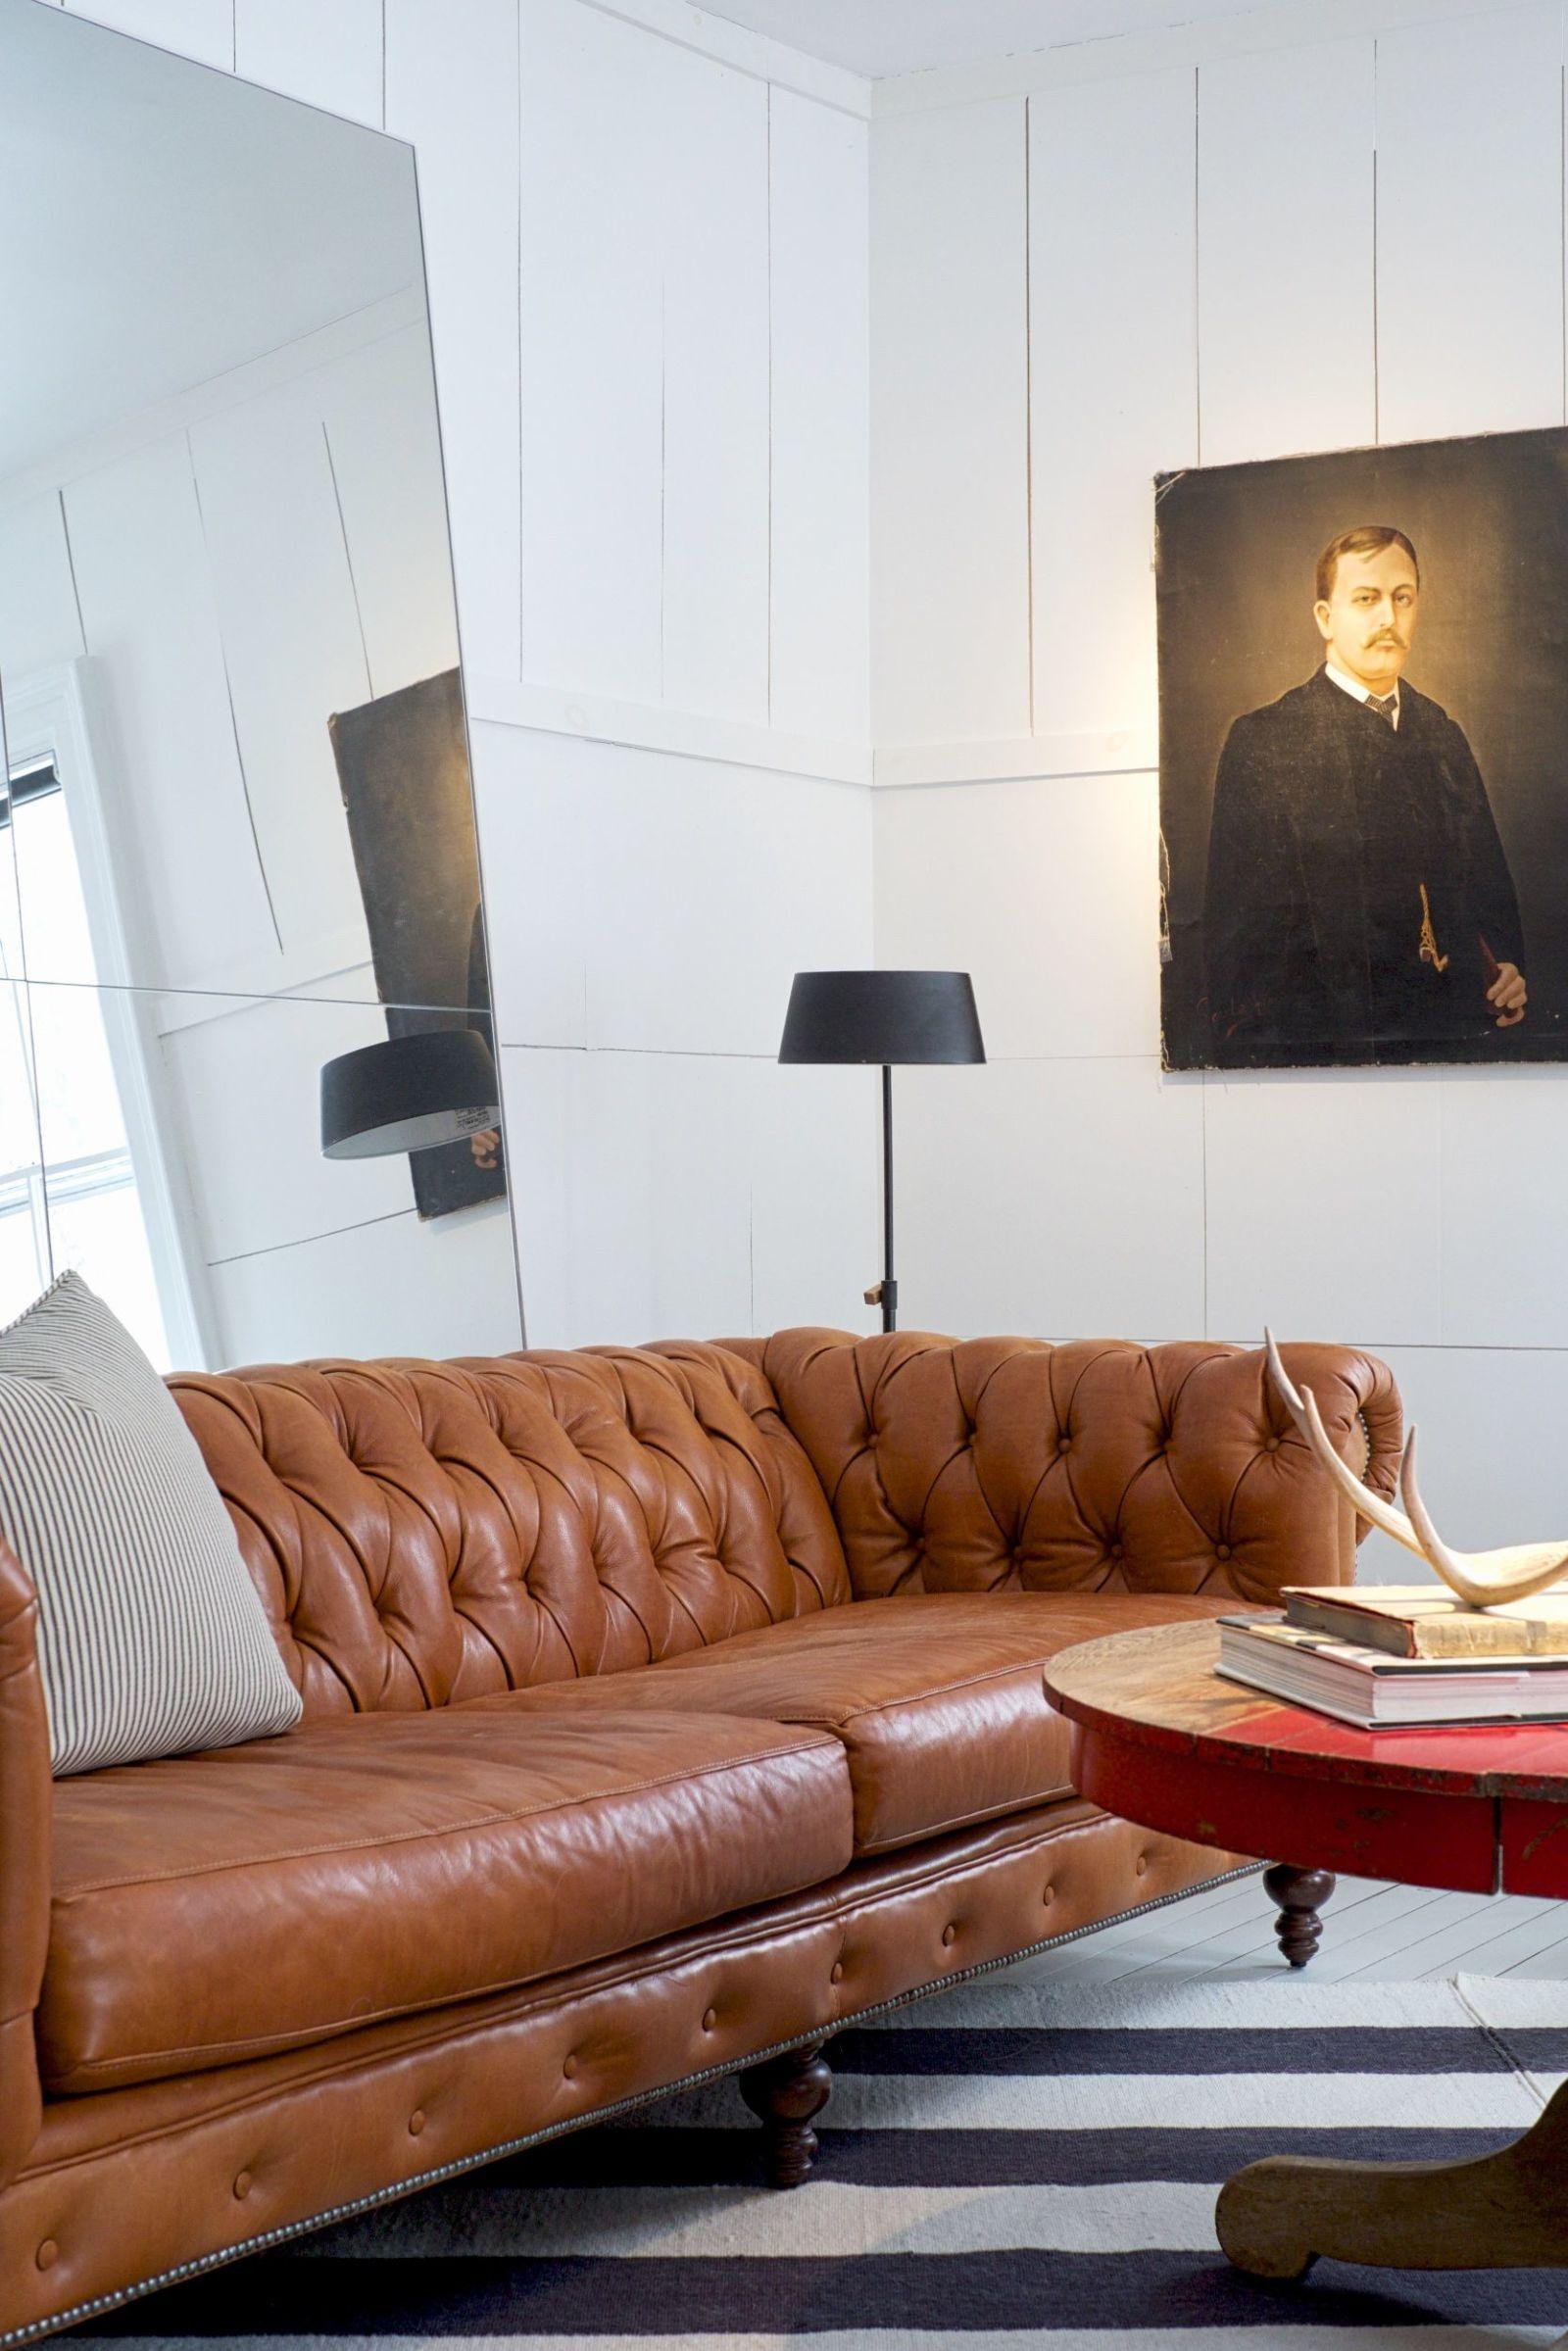 Chris Stout Hazardu2014founder Of Boutique Online Furniture Retailer  Roger+Chrisu2014shares His Expert Advice On Navigating The Often Overwhelming  World Of Sofas.